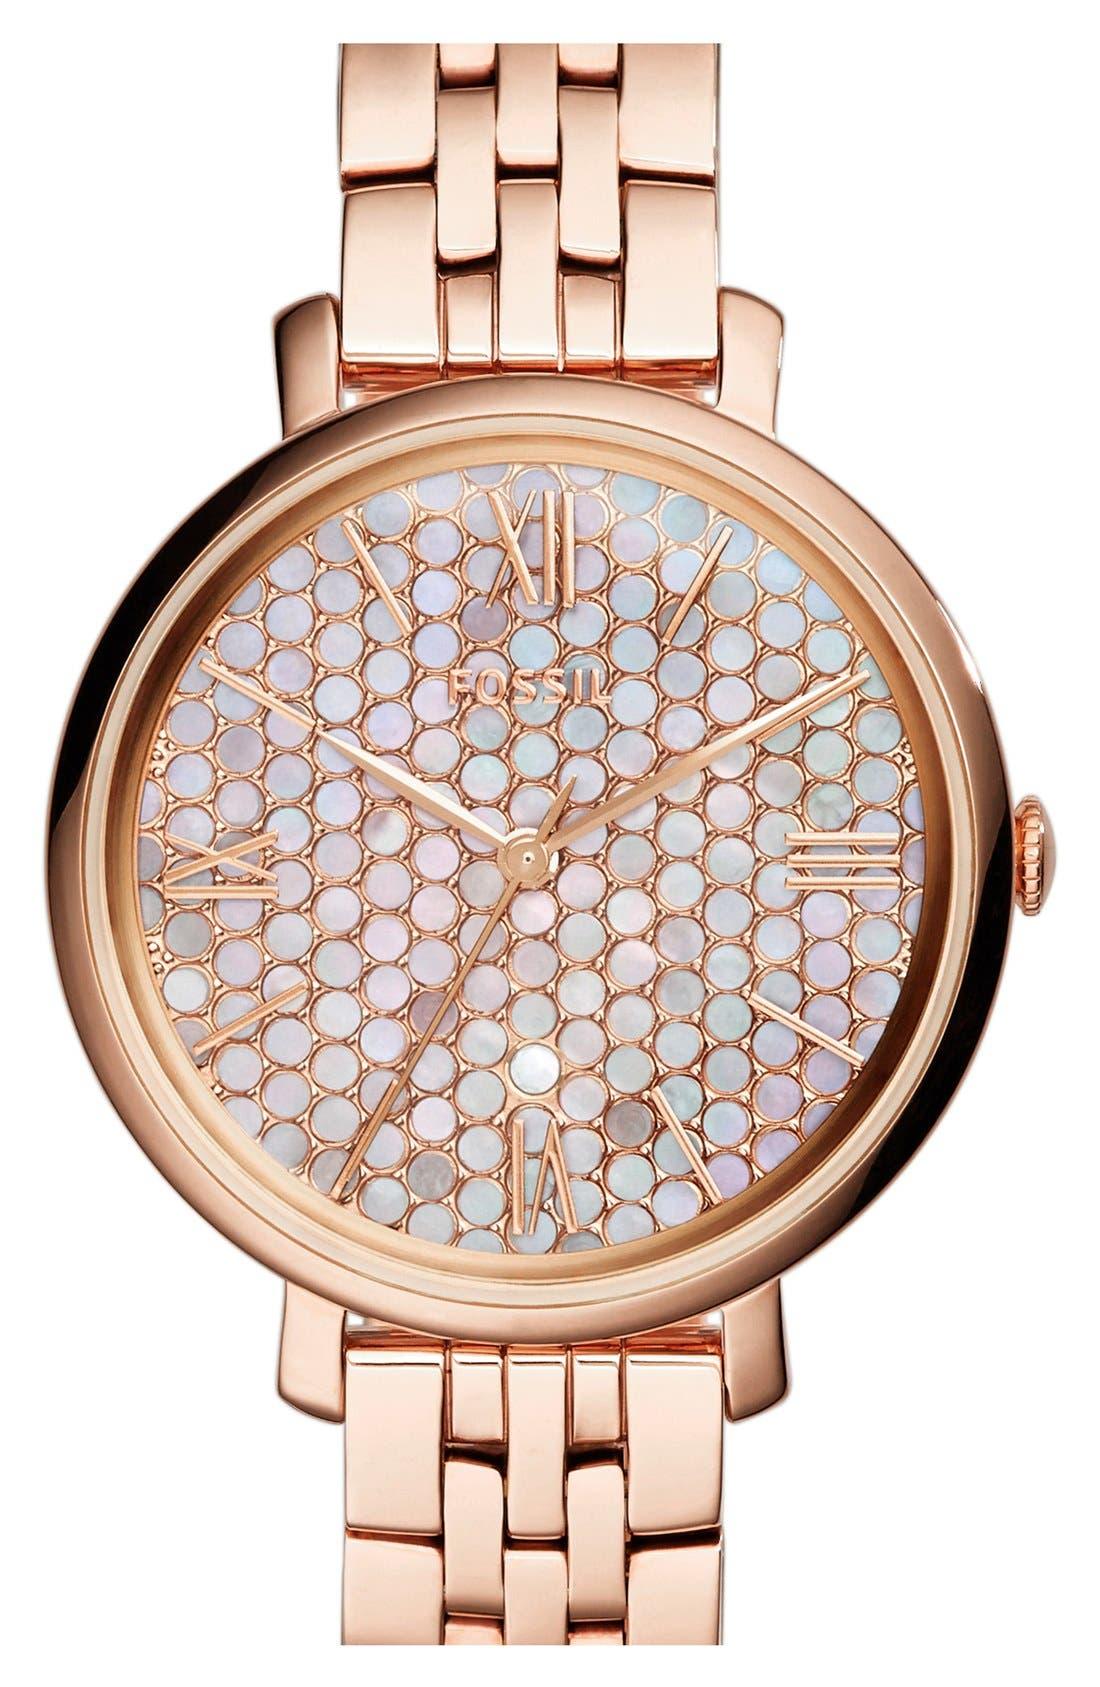 Main Image - Fossil 'Jacqueline' Round Bracelet Watch, 36mm